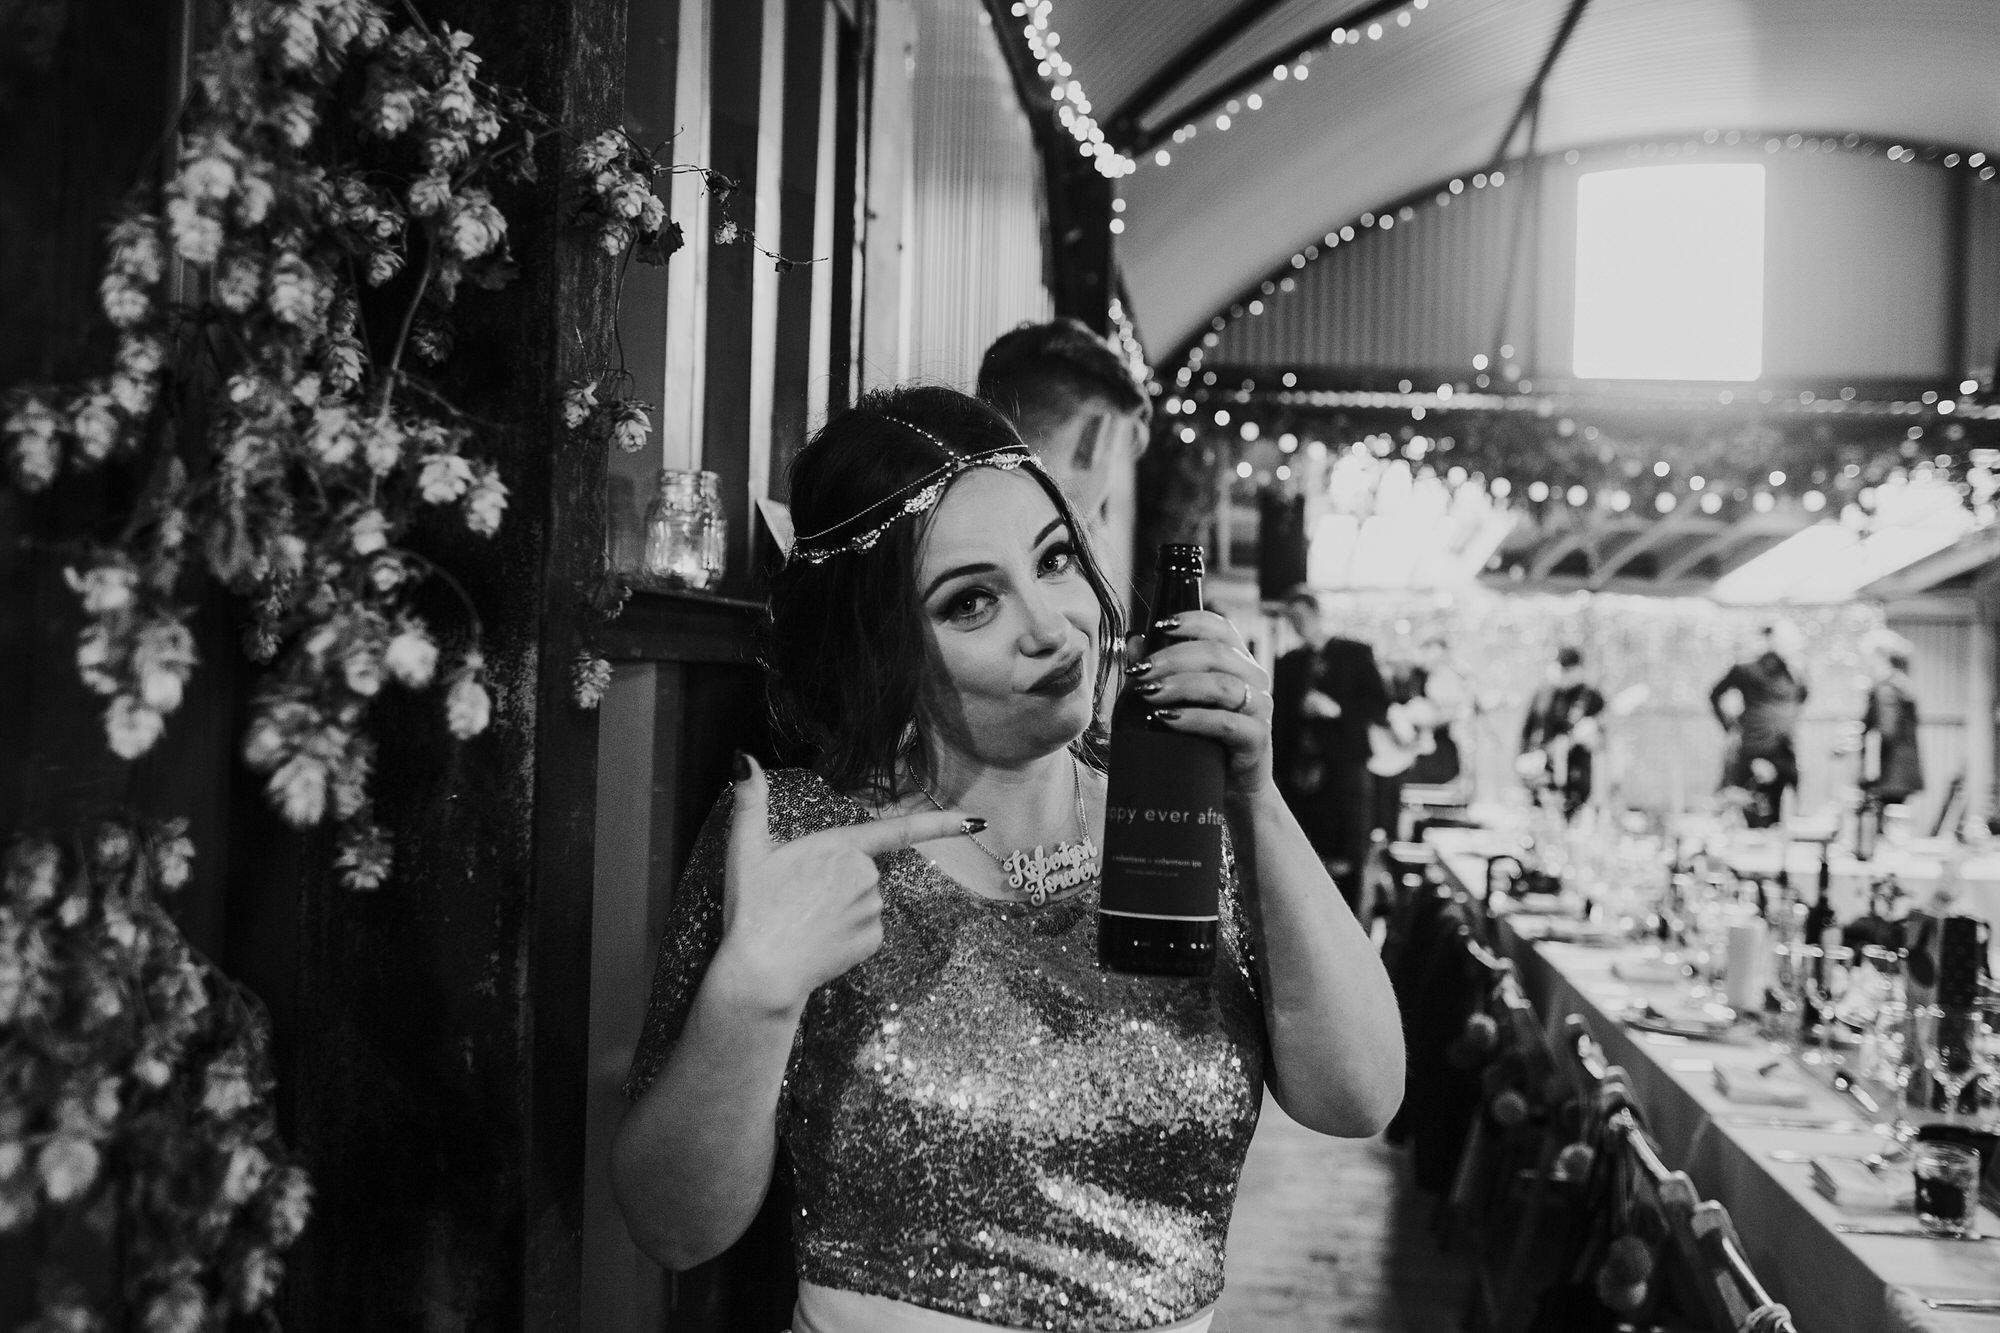 043 TIN SHED KNOCKRAICH FARM WEDDING ALTERNATIVE BRIDE ZOE ALEXANDRA PHOTOGRAPHY